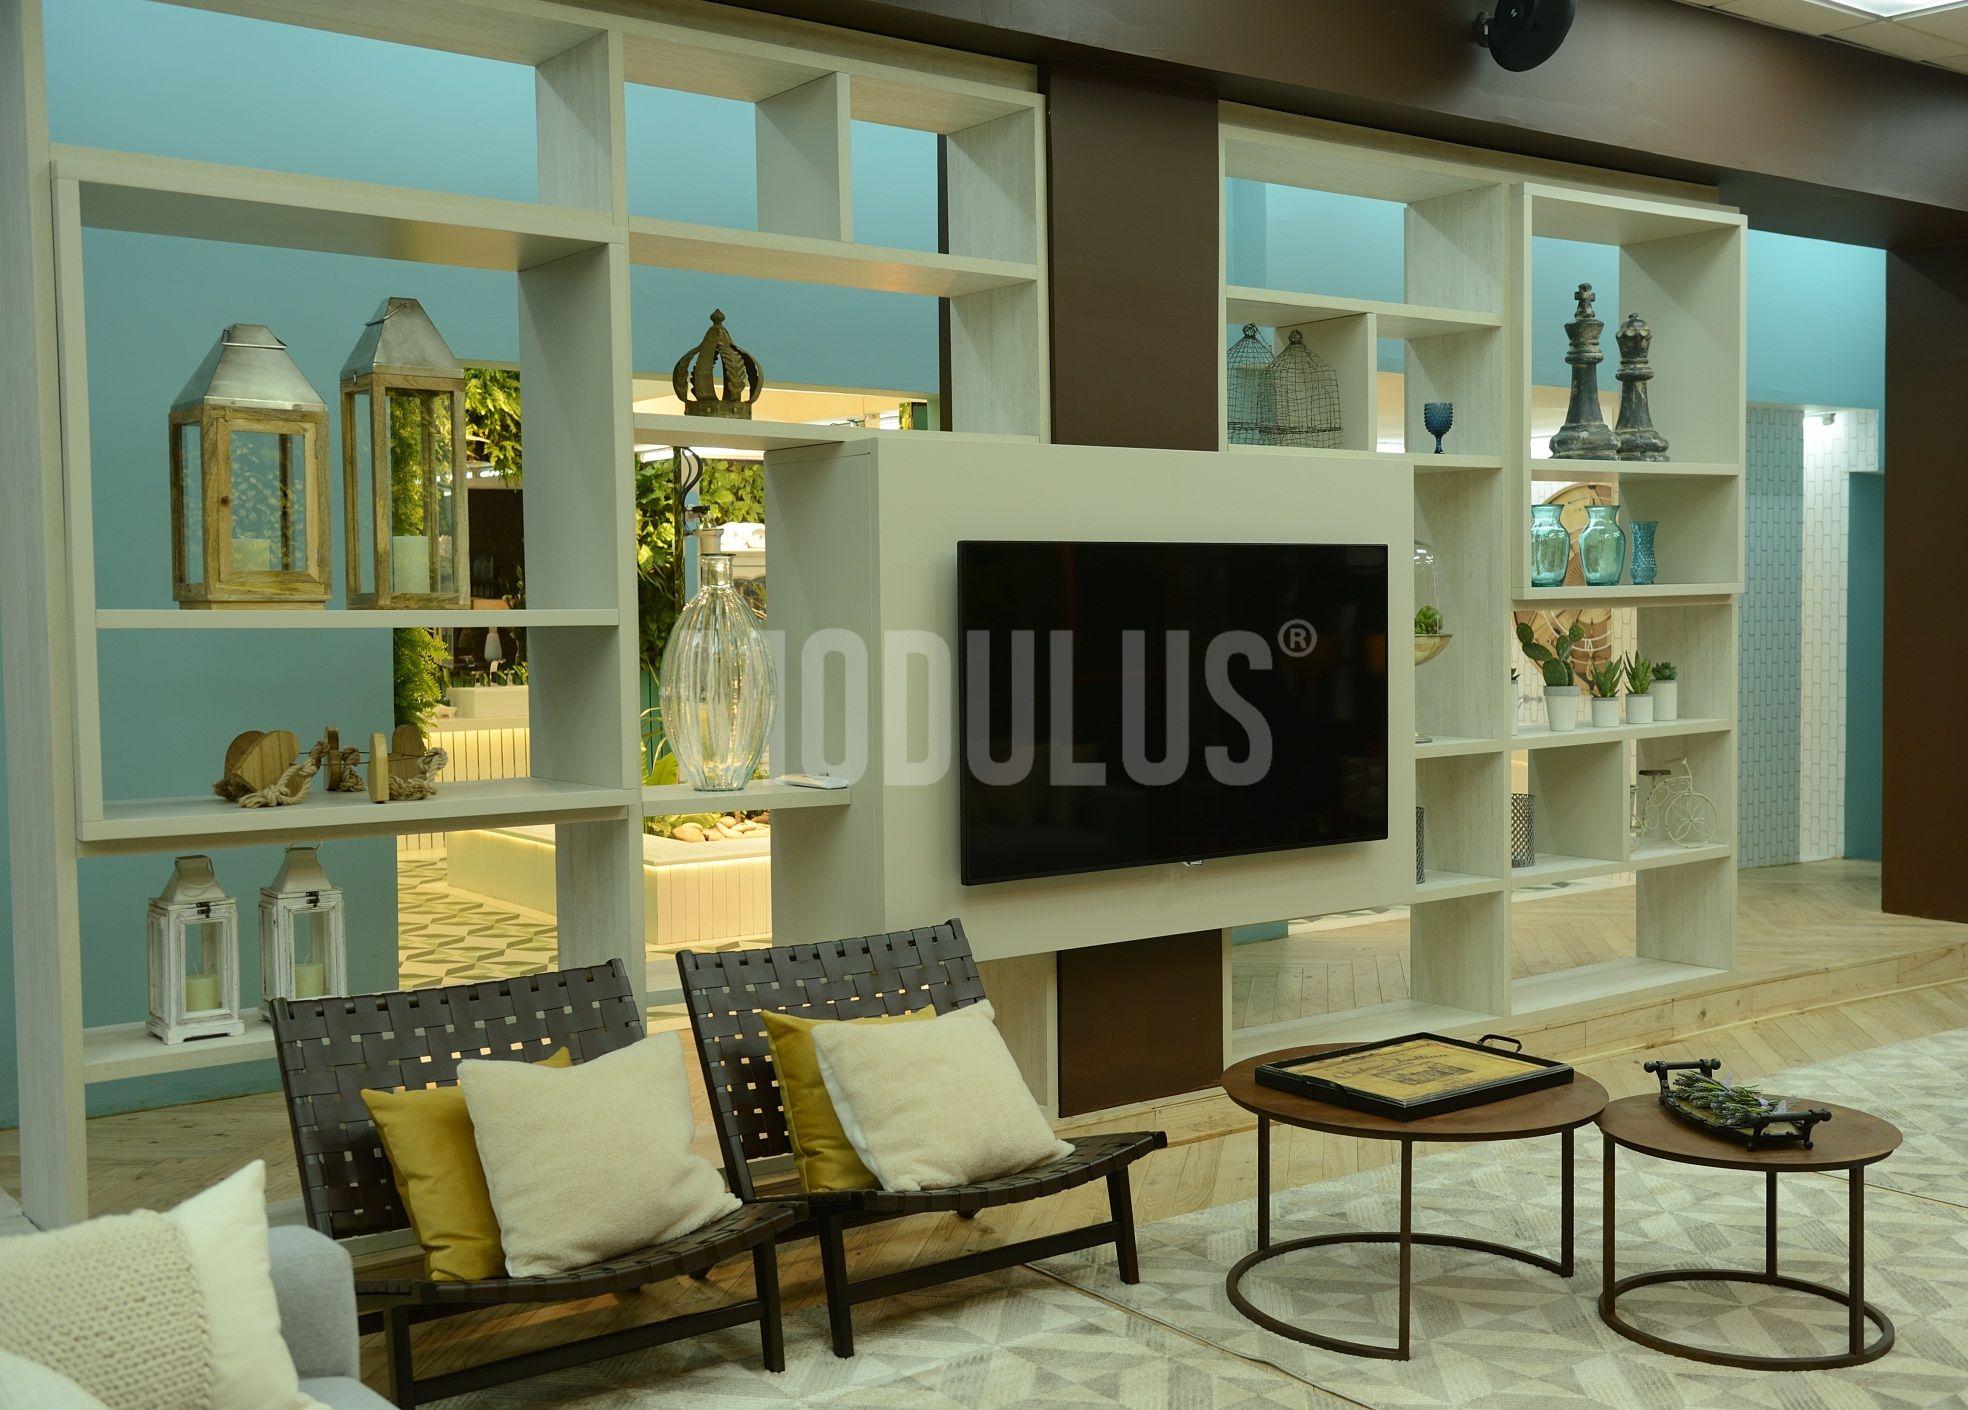 Mueble De Tv Biblioteca Divisor De Ambientes Modulus Fotos  # Muebles Bibliotecas Para Living